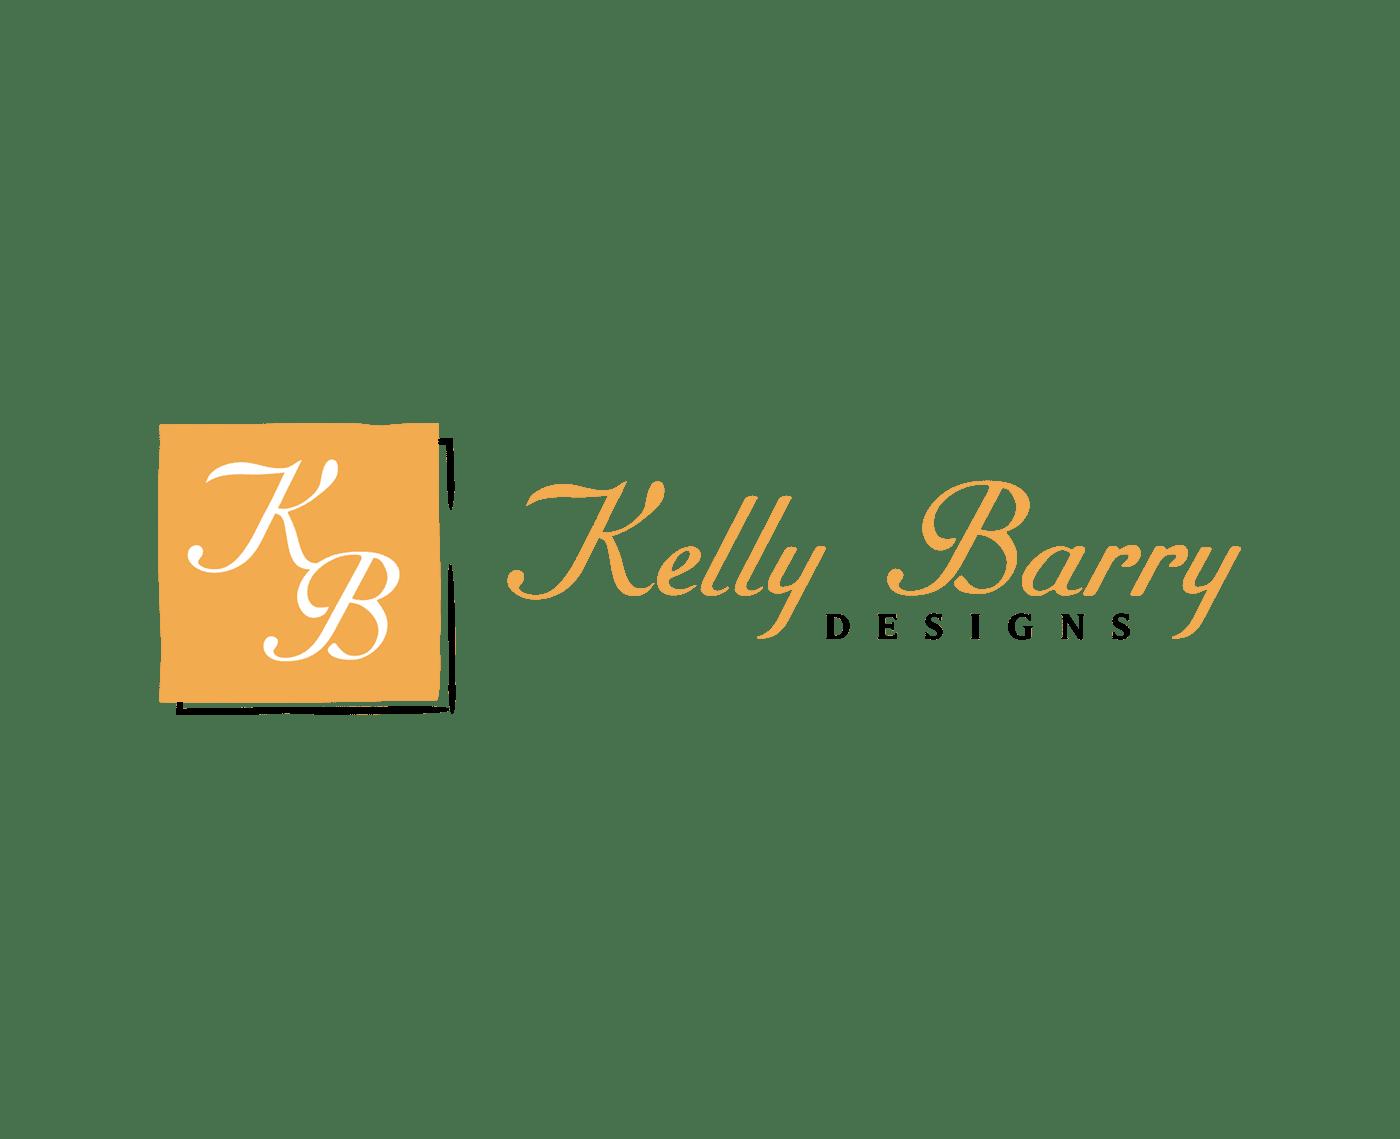 Kelly Barry Designs Logo Design Concept